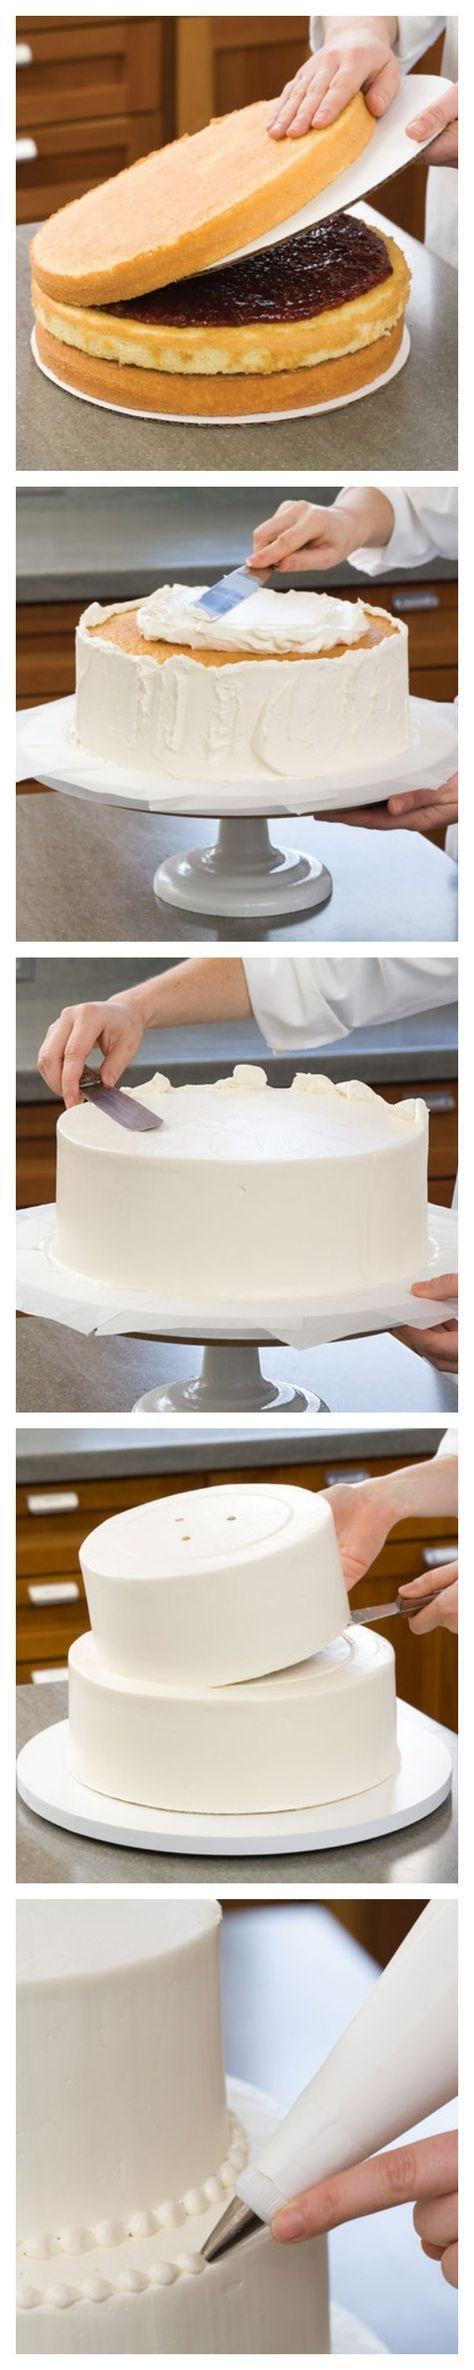 We've Got the Secrets to Making a DIY Homemade Wedding Cake.